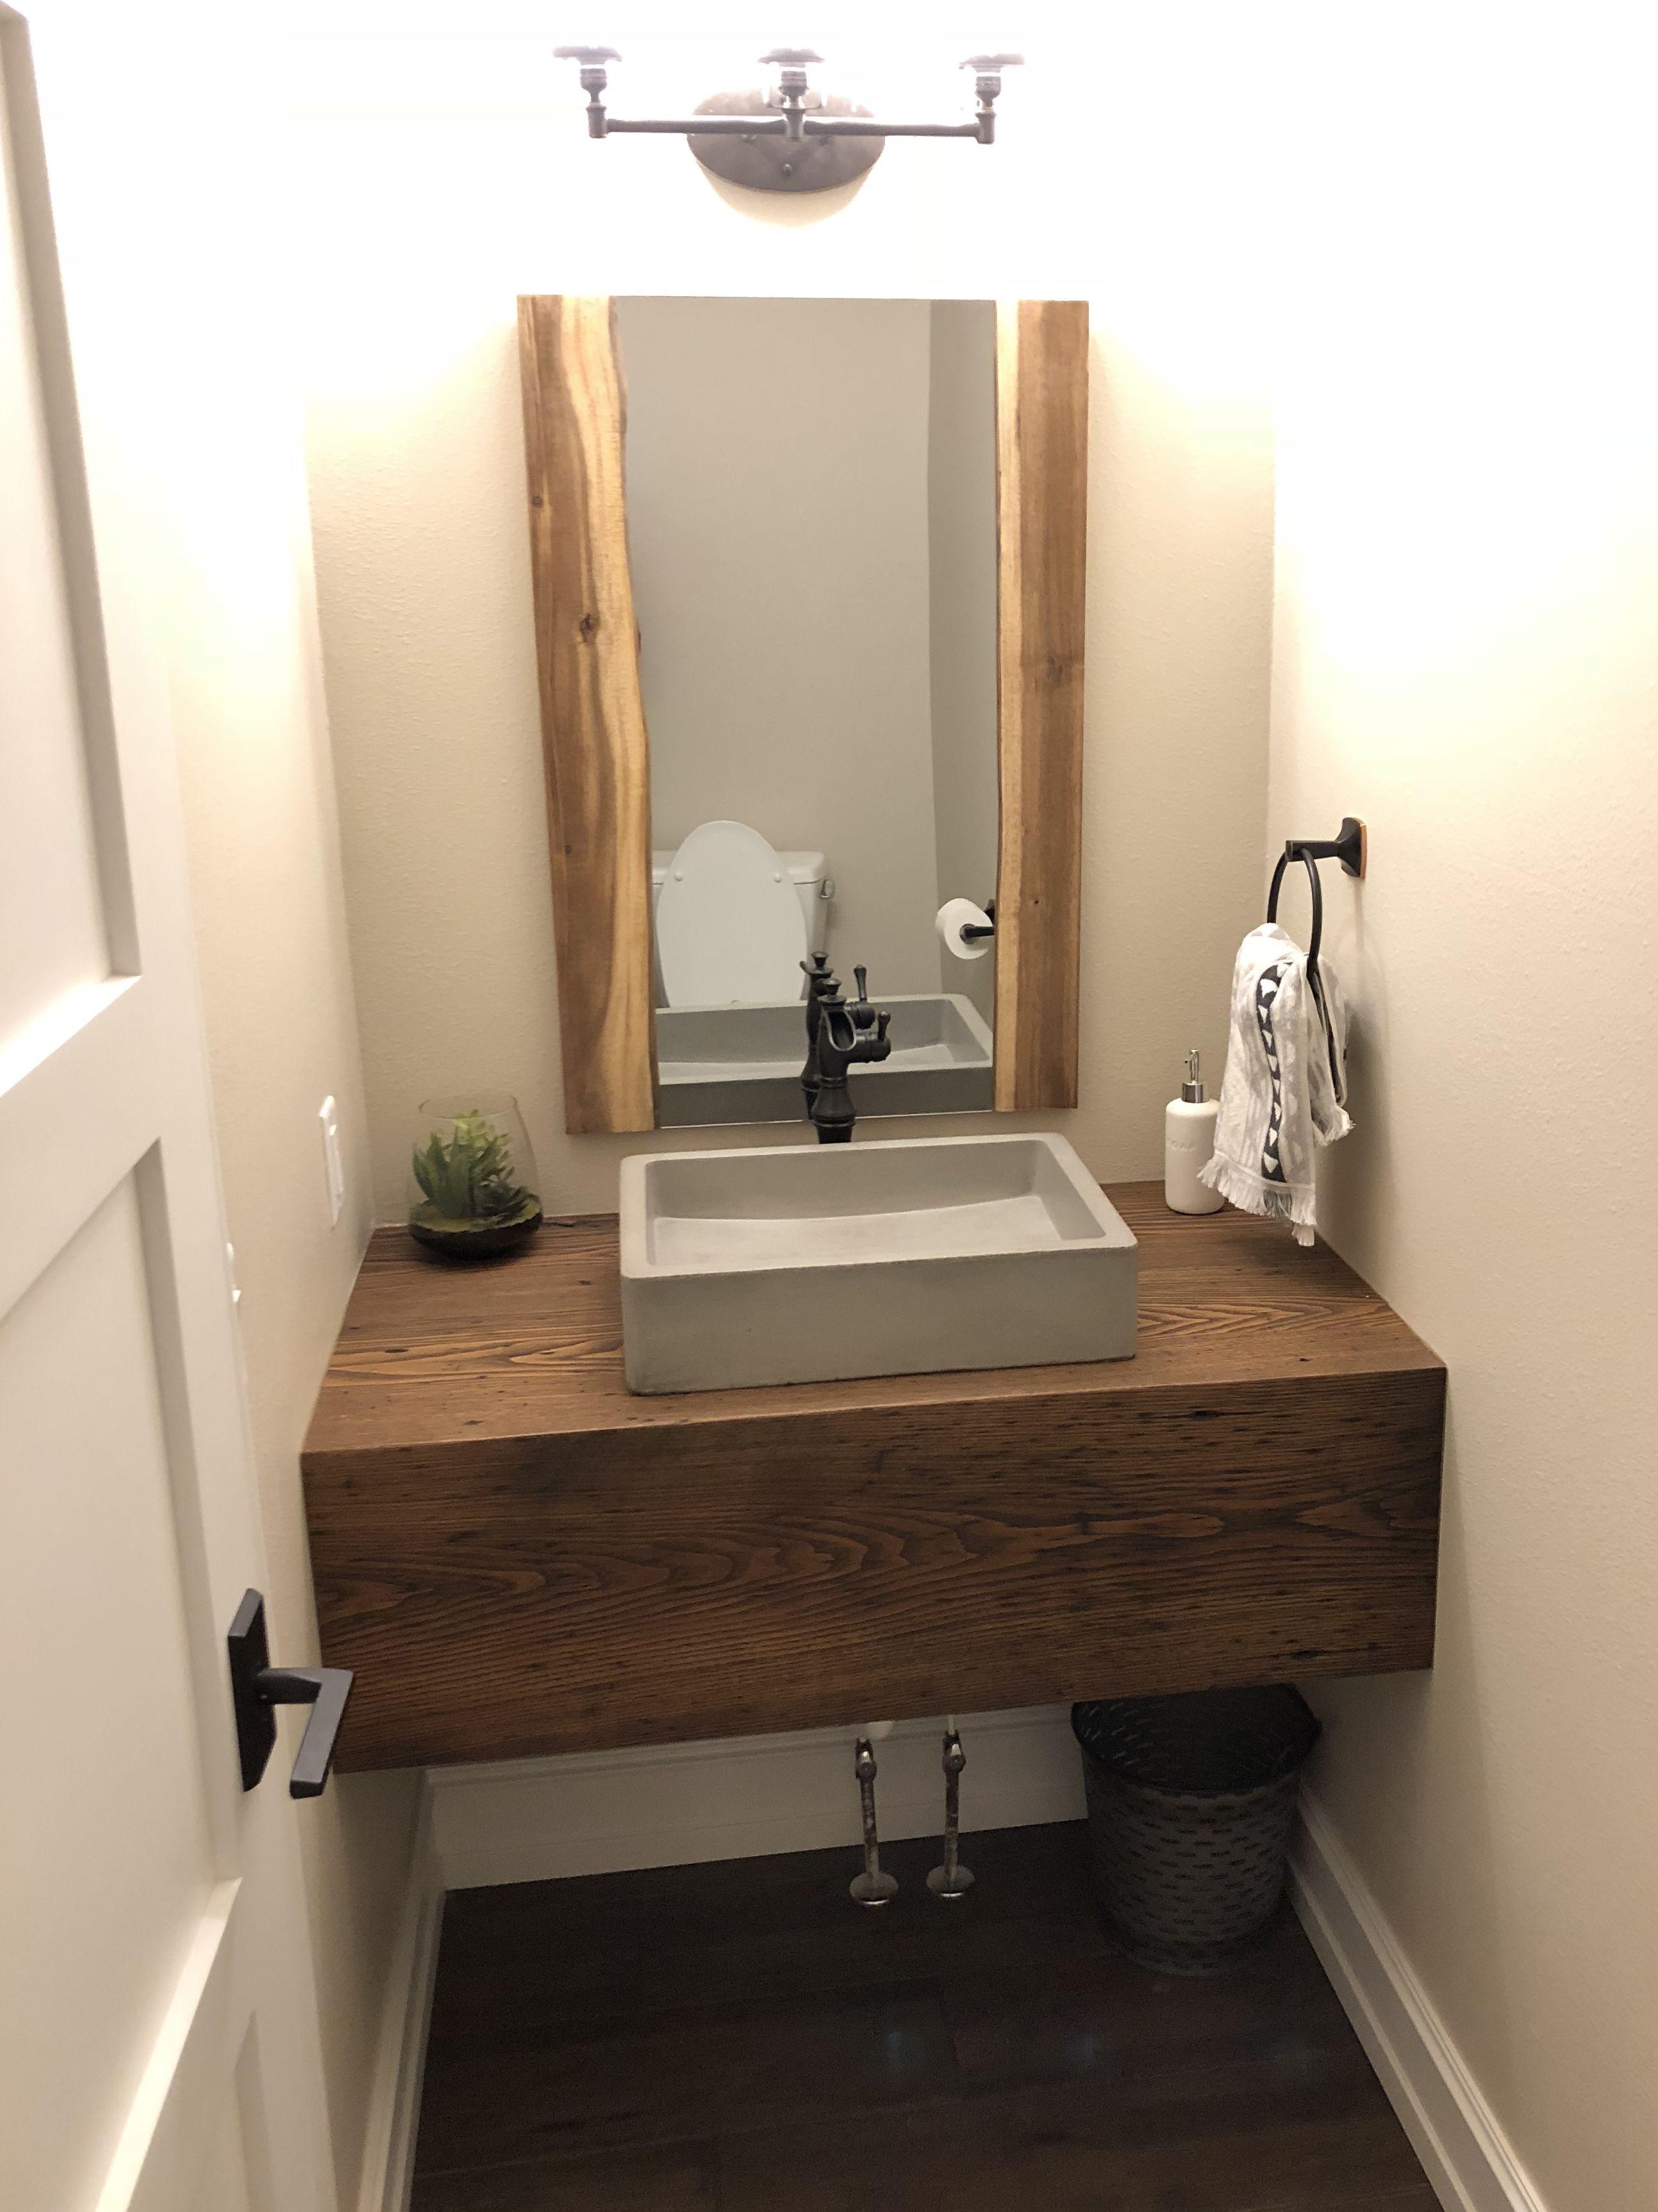 Guest Bathroom Floating Wood Block Vanity Concrete Sink Modern Rustic Urban Far Wooden Bathroom Vanity Floating Shelves Bathroom Floating Bathroom Vanities [ 3451 x 2587 Pixel ]